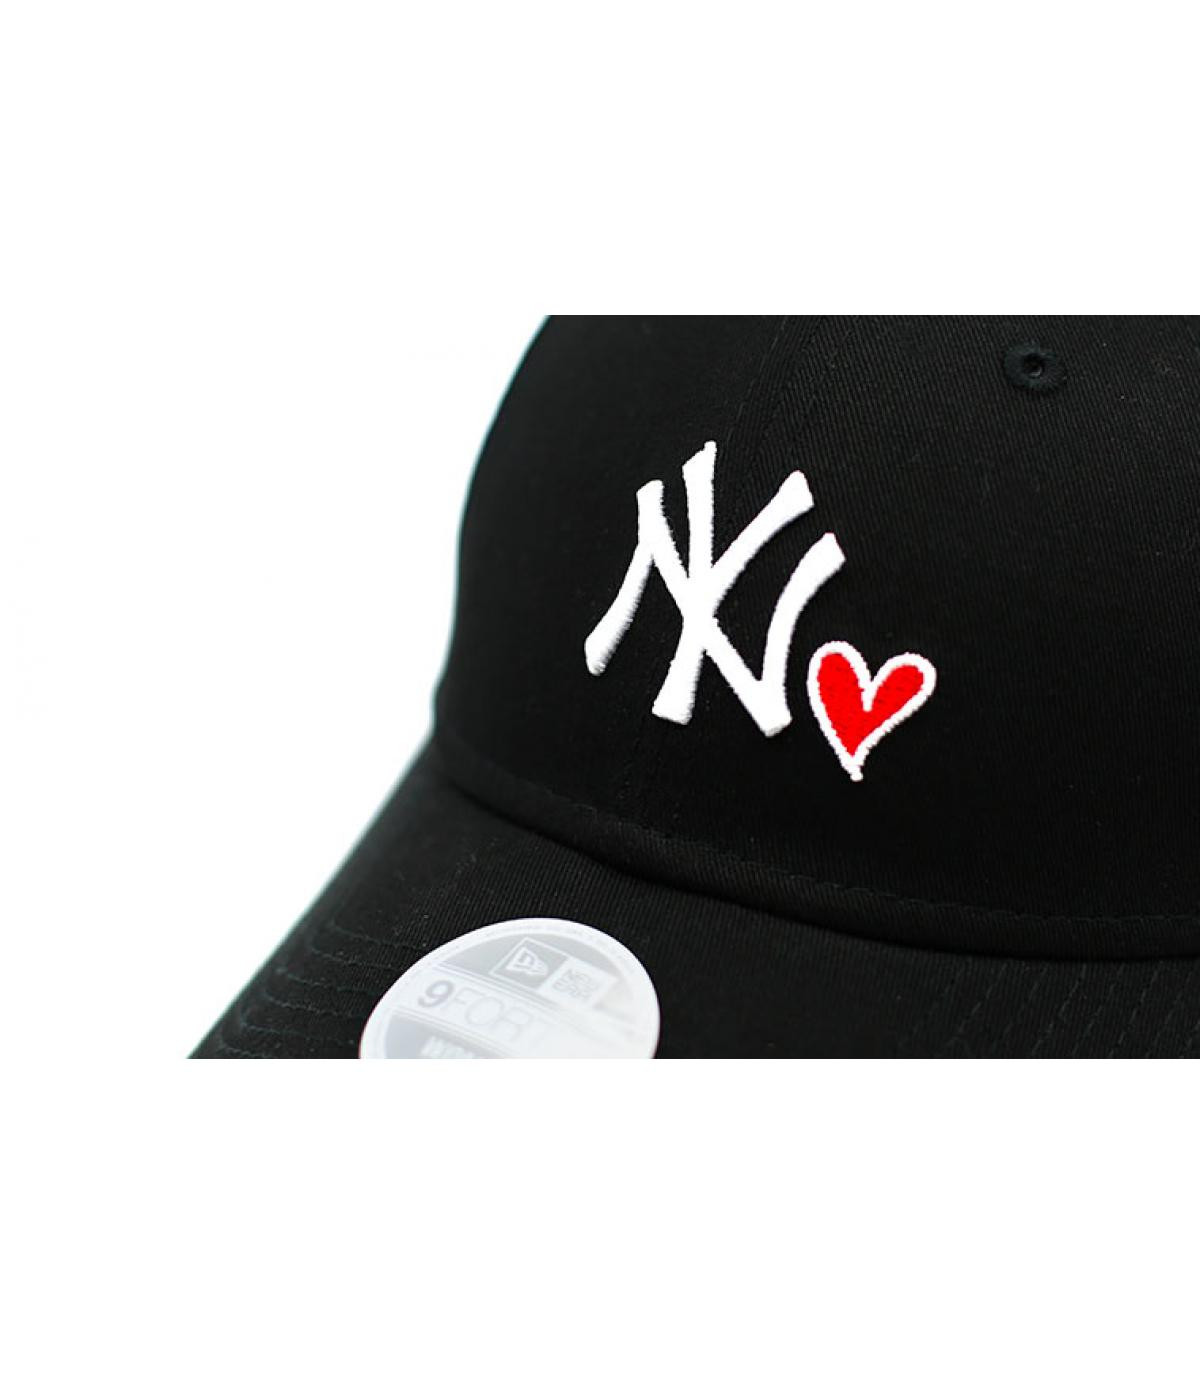 Details Casquette Wmns Heart NY 940 black - afbeeling 3